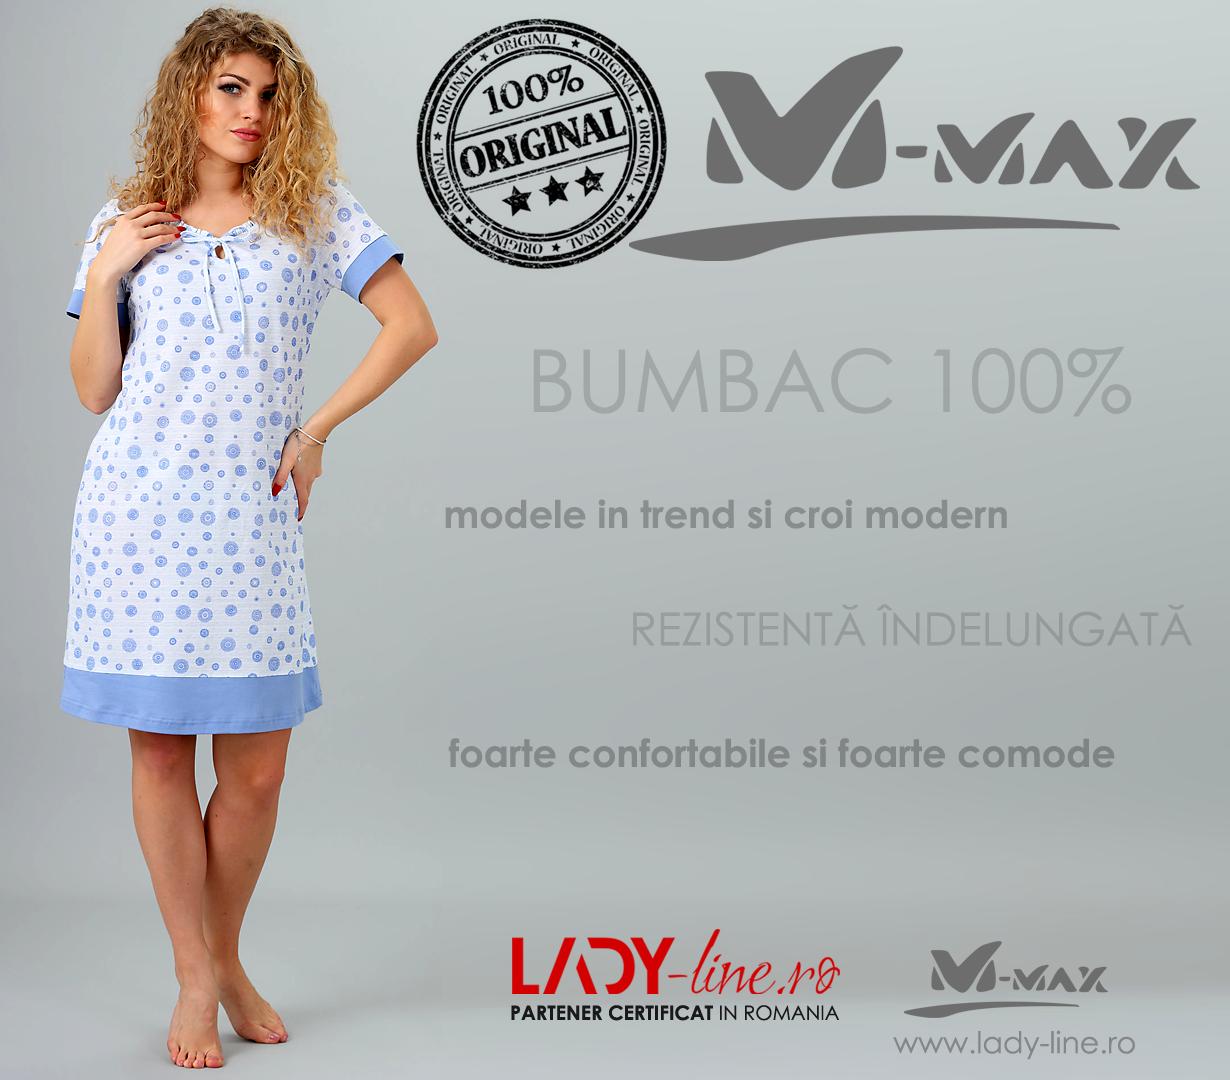 Camasa de Noapte M-Max, Bumbac 100%, 'Blue Mood'